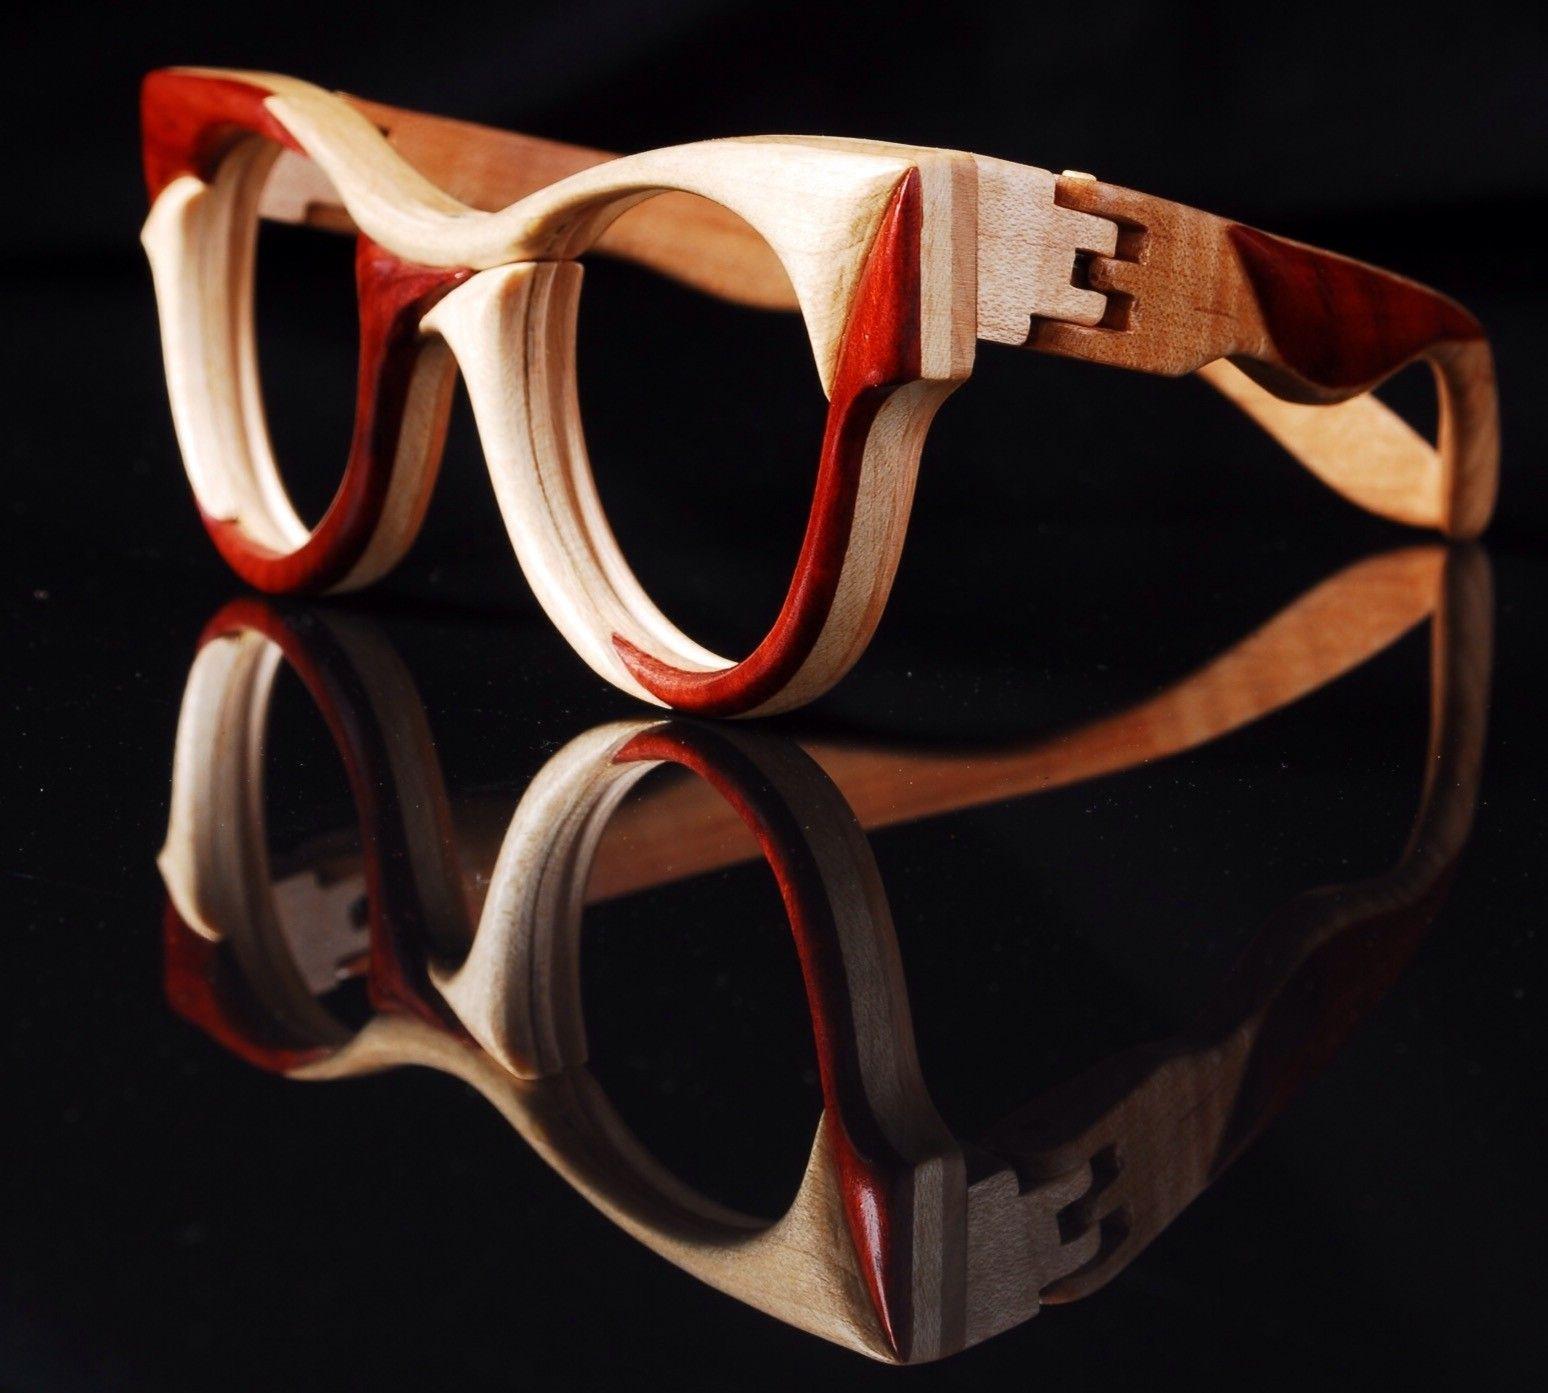 Spectacular Handmade Wooden Sunglasses - 2016-05 Jaromir Cateye 09.jpg